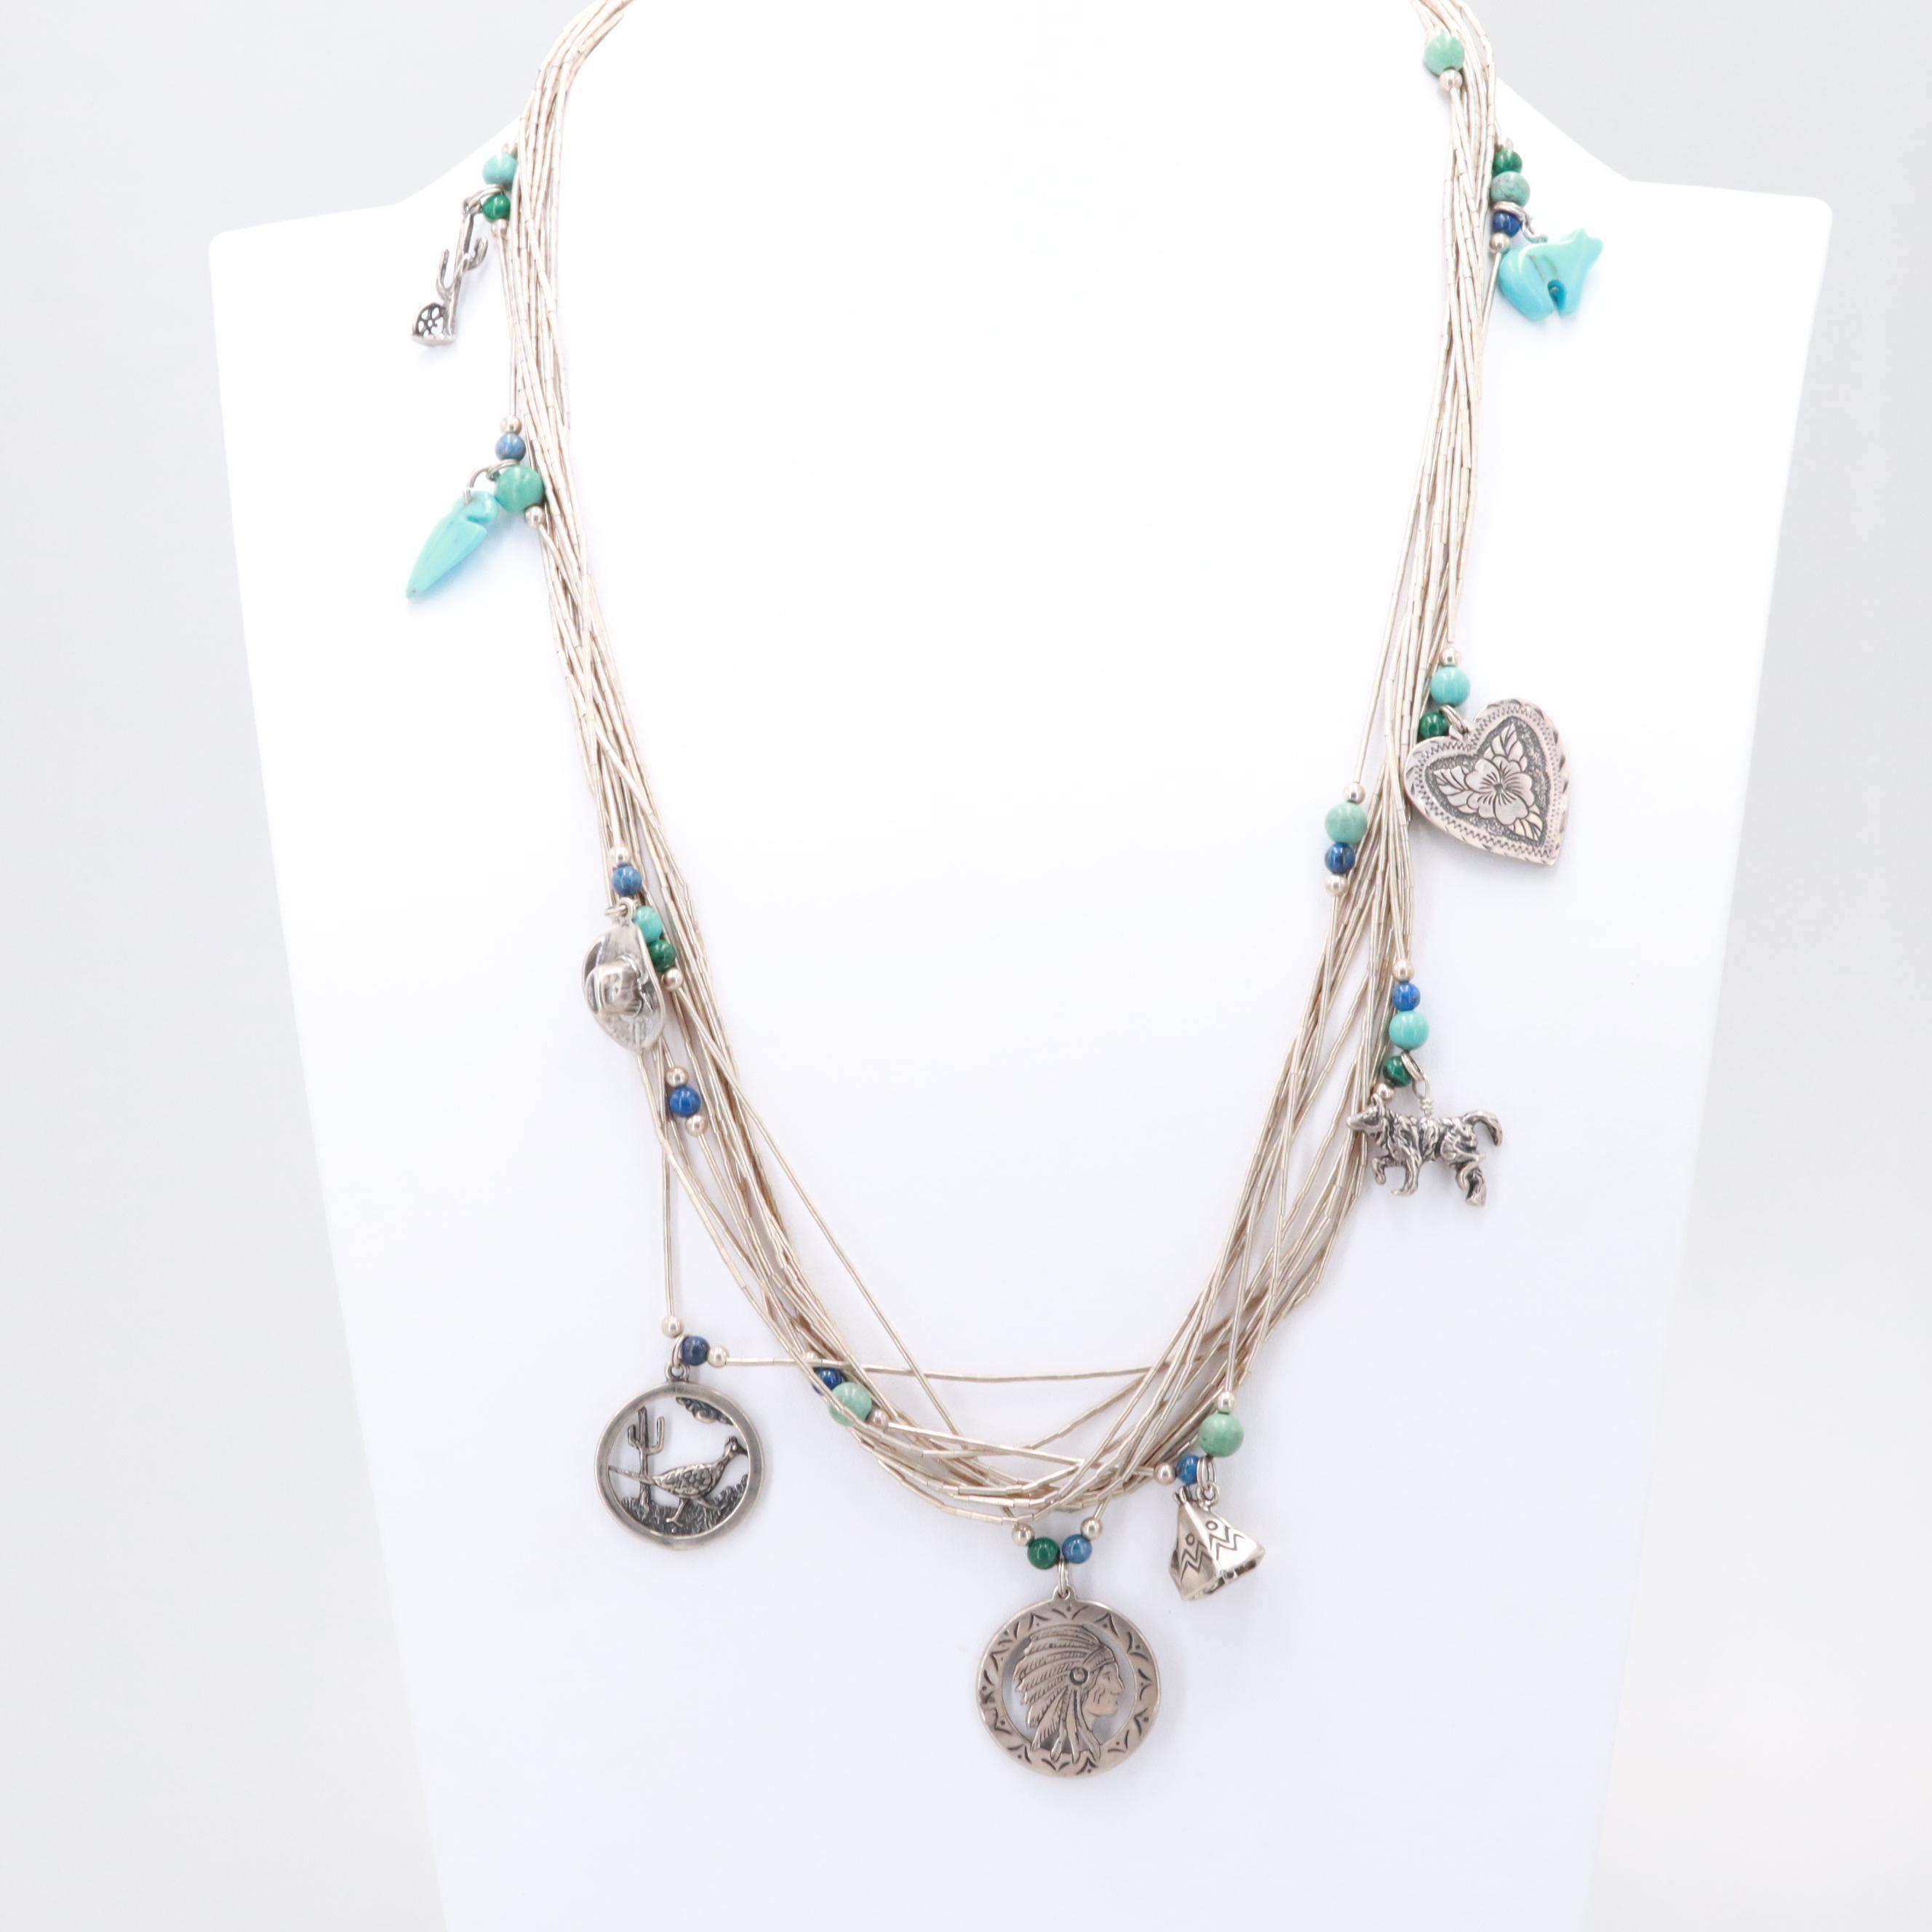 Southwestern Style Sterling Silver Malachite, Lapis Lazuli and Howlite Necklace